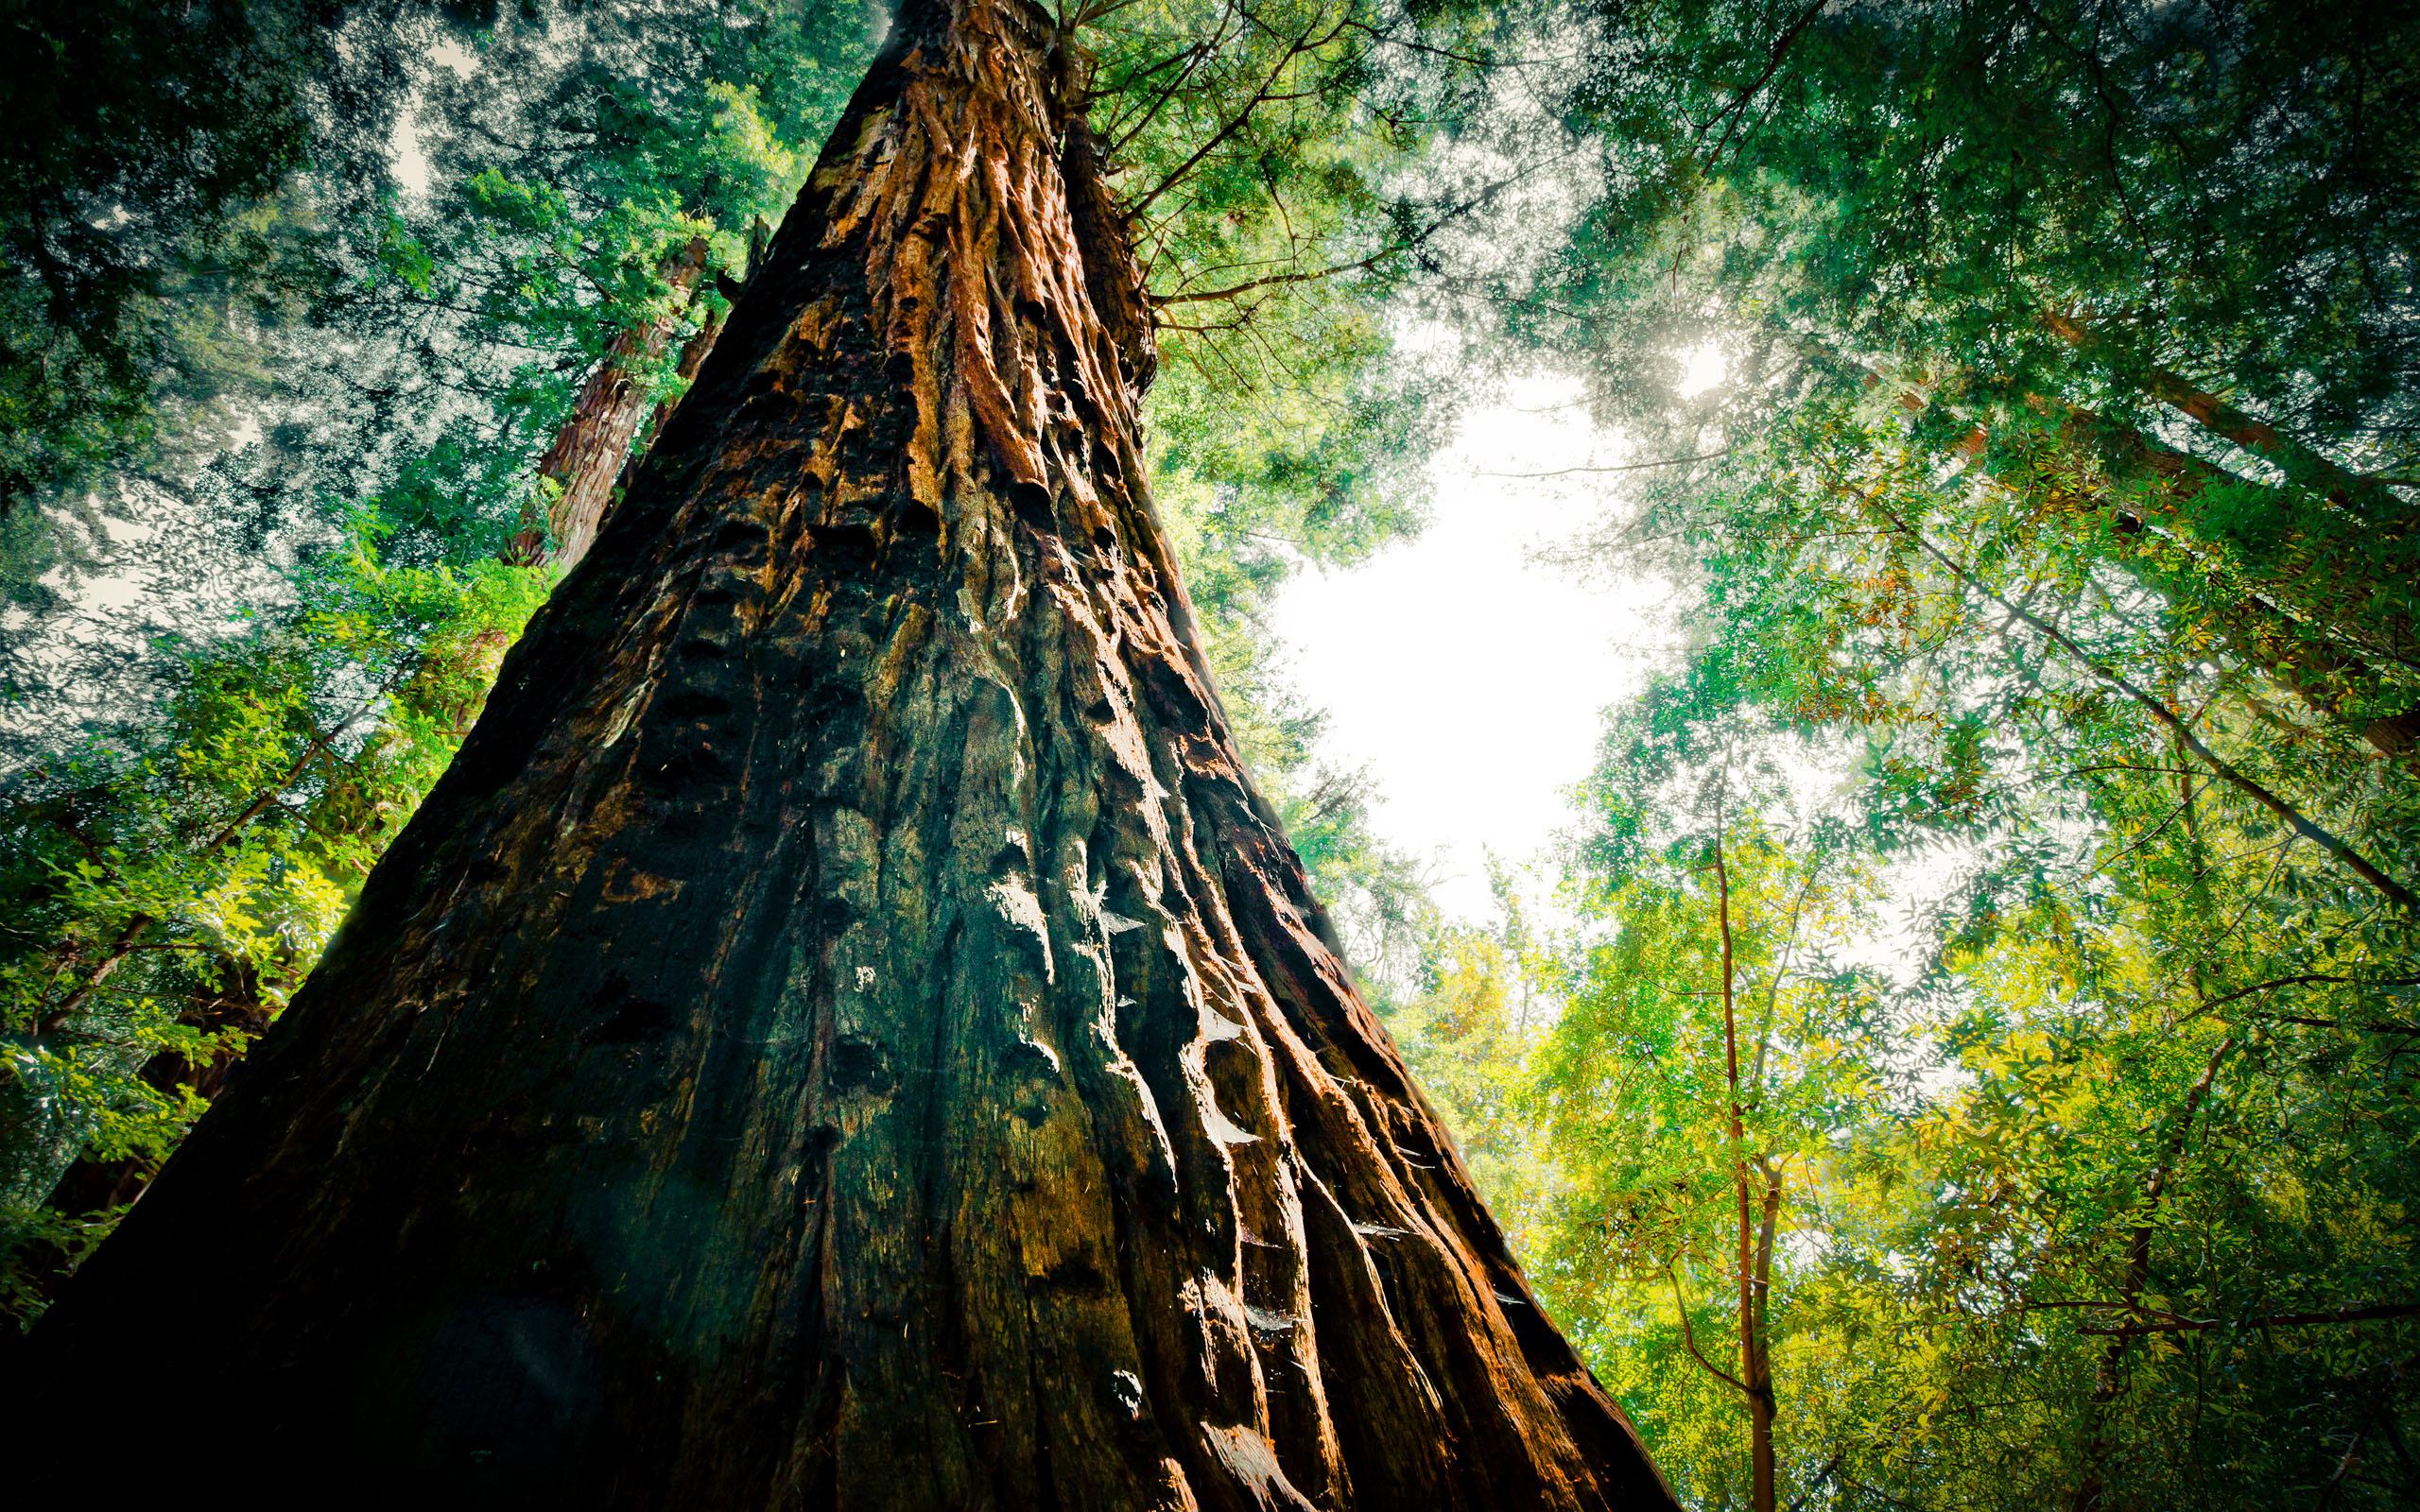 4k wallpaper nature redwoods - photo #18